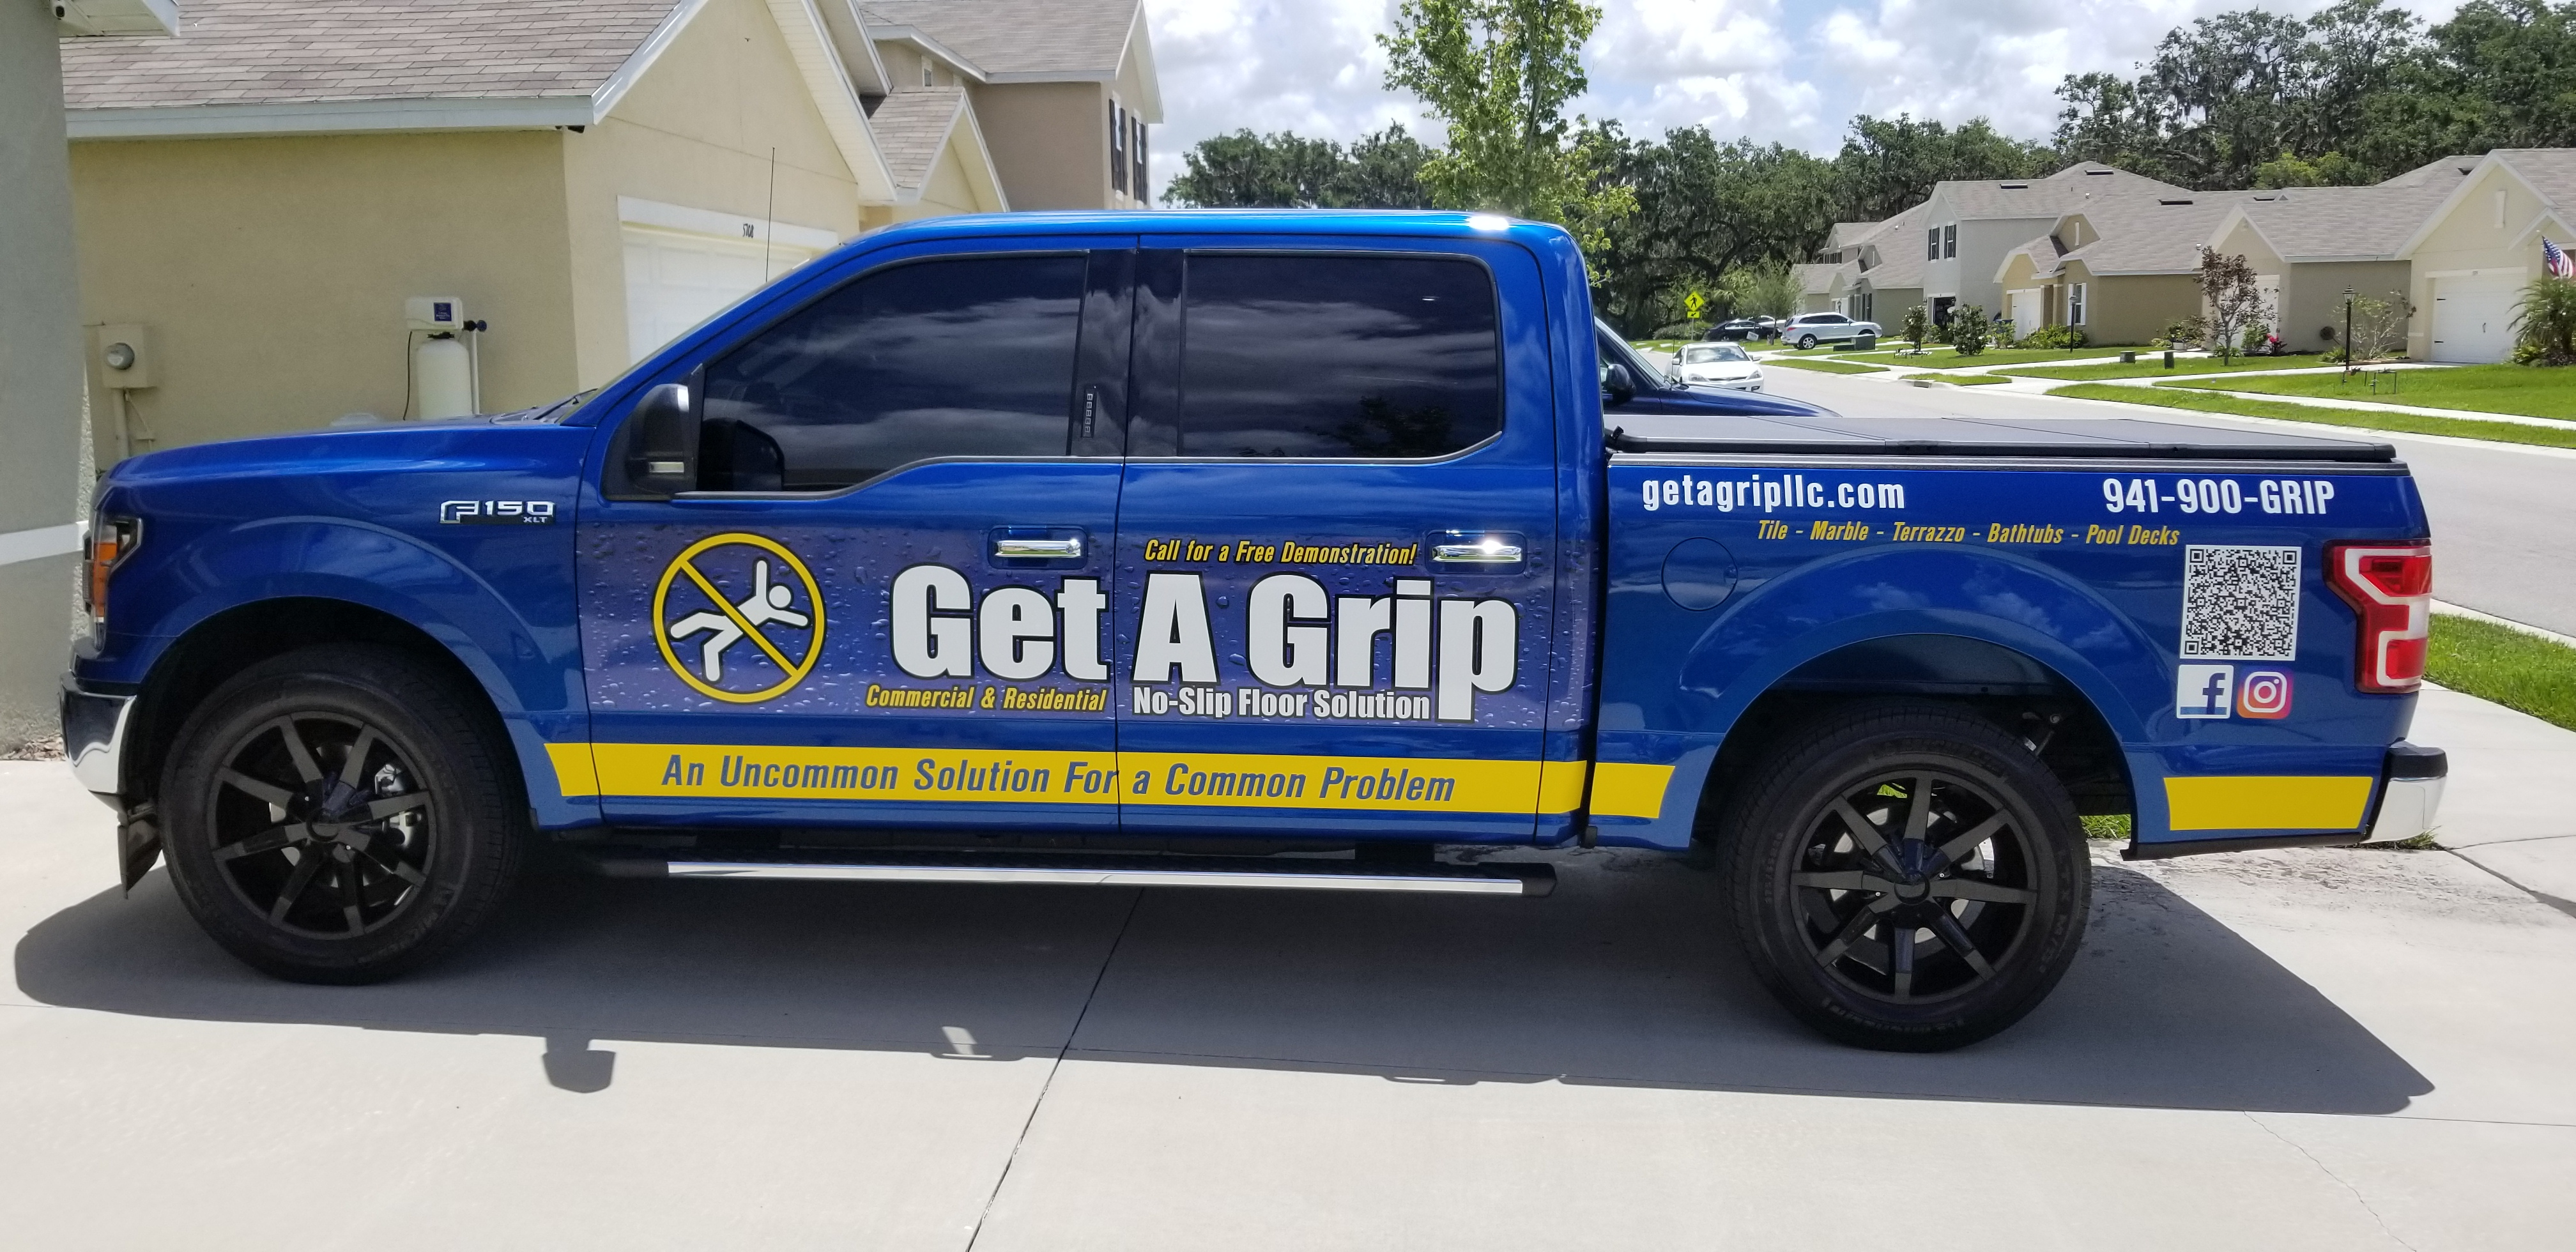 Get A Grip image 0